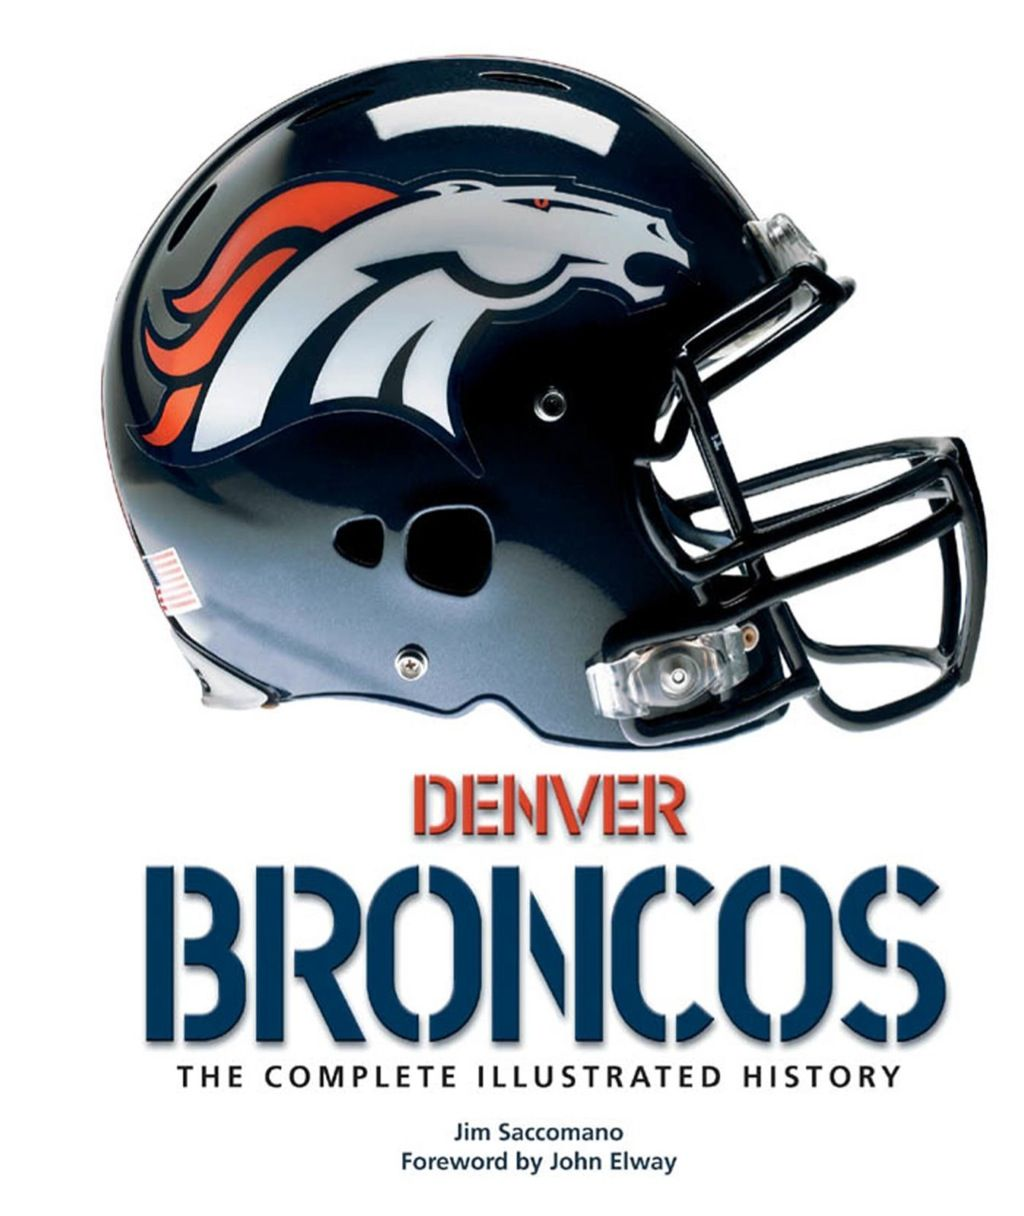 Denver Broncos (eBook) Denver broncos, Broncos, Denver